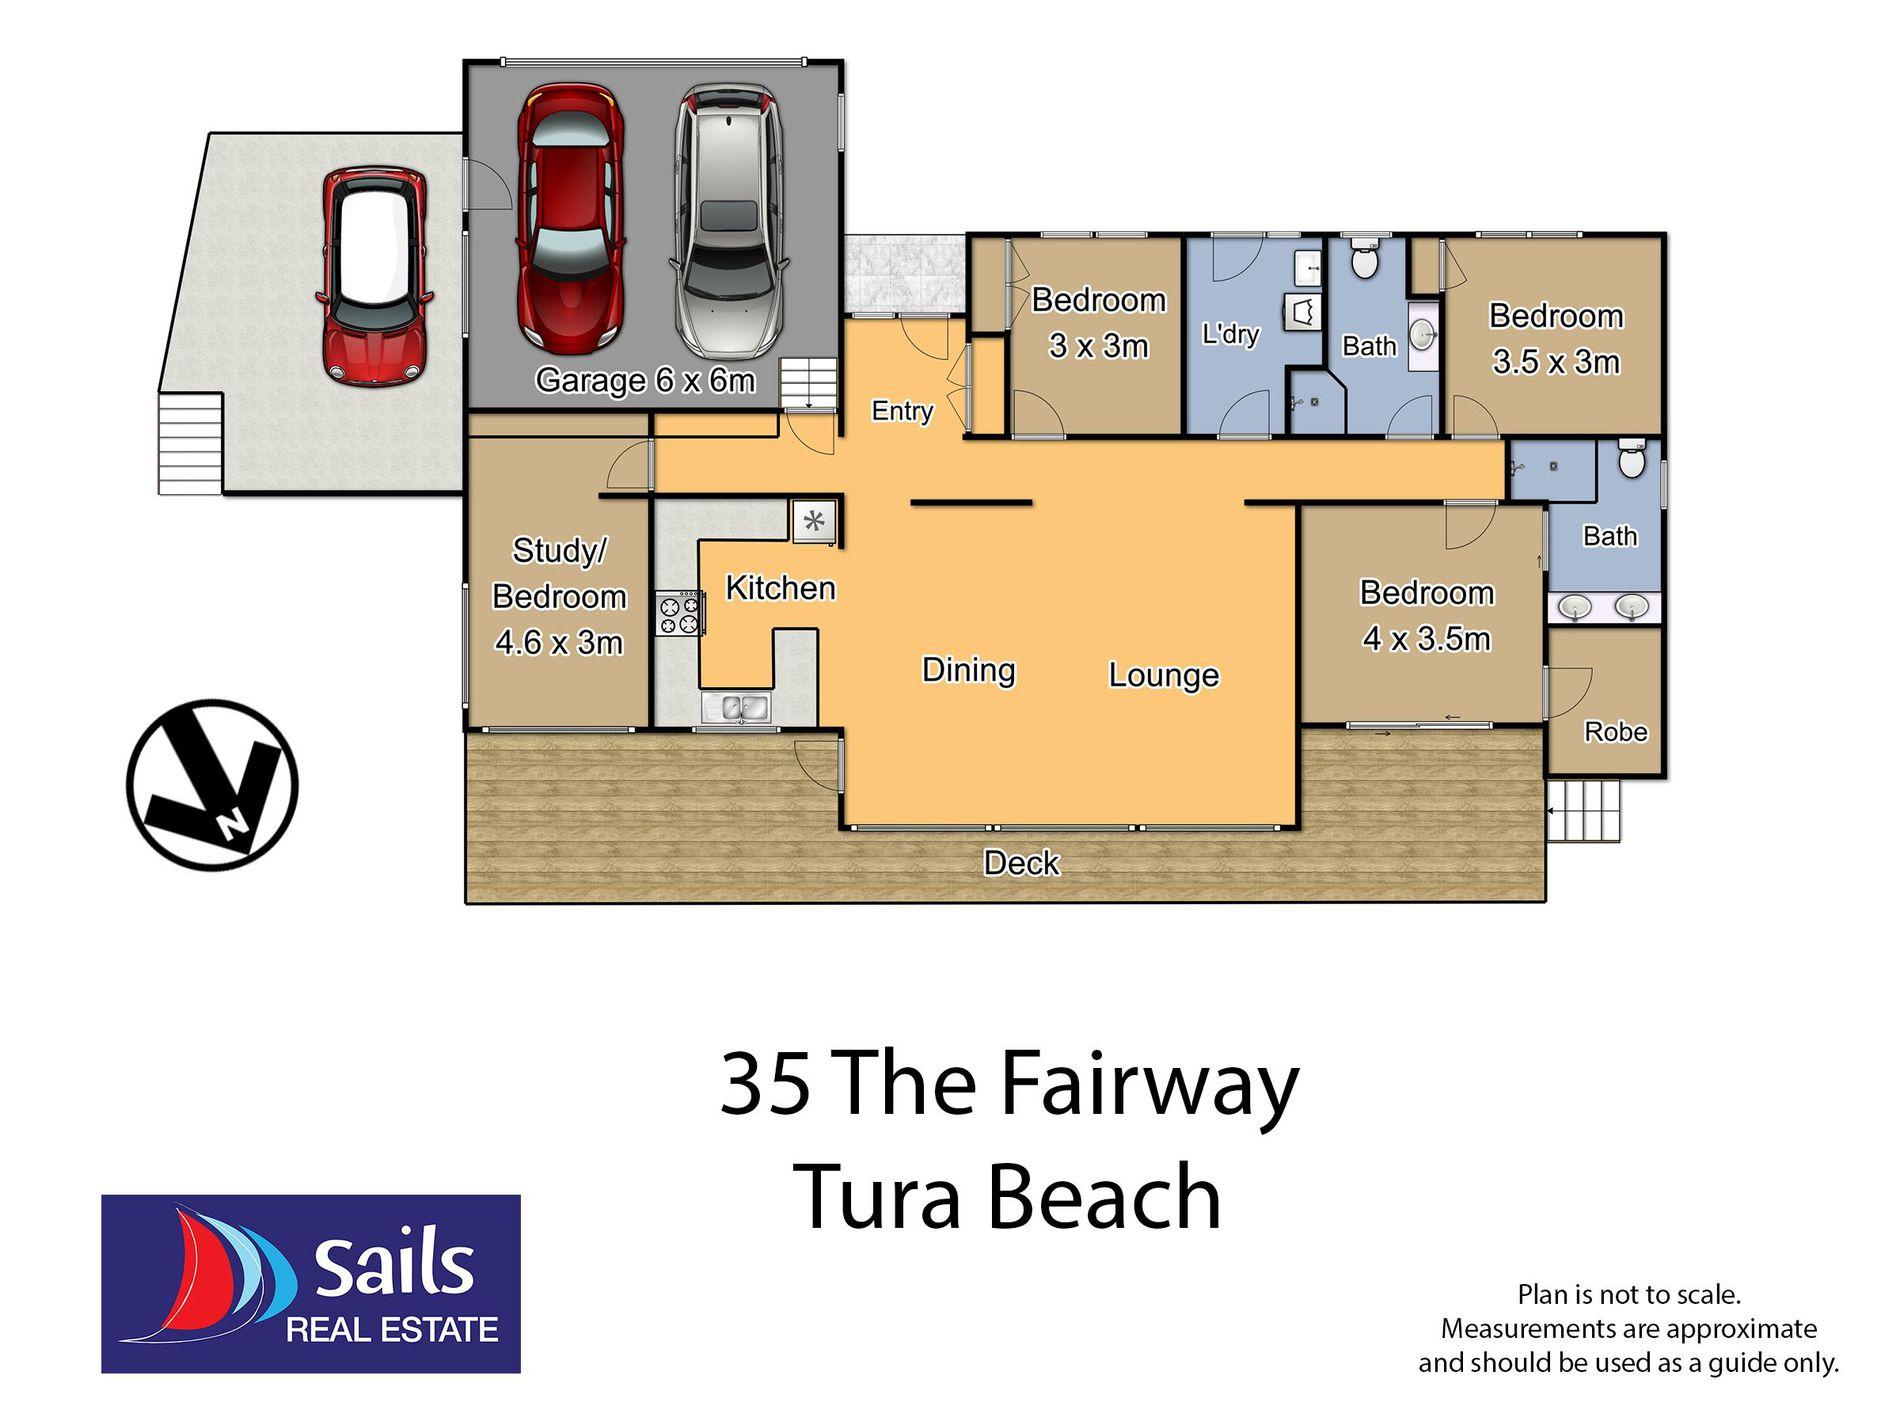 35 The Fairway, Tura Beach